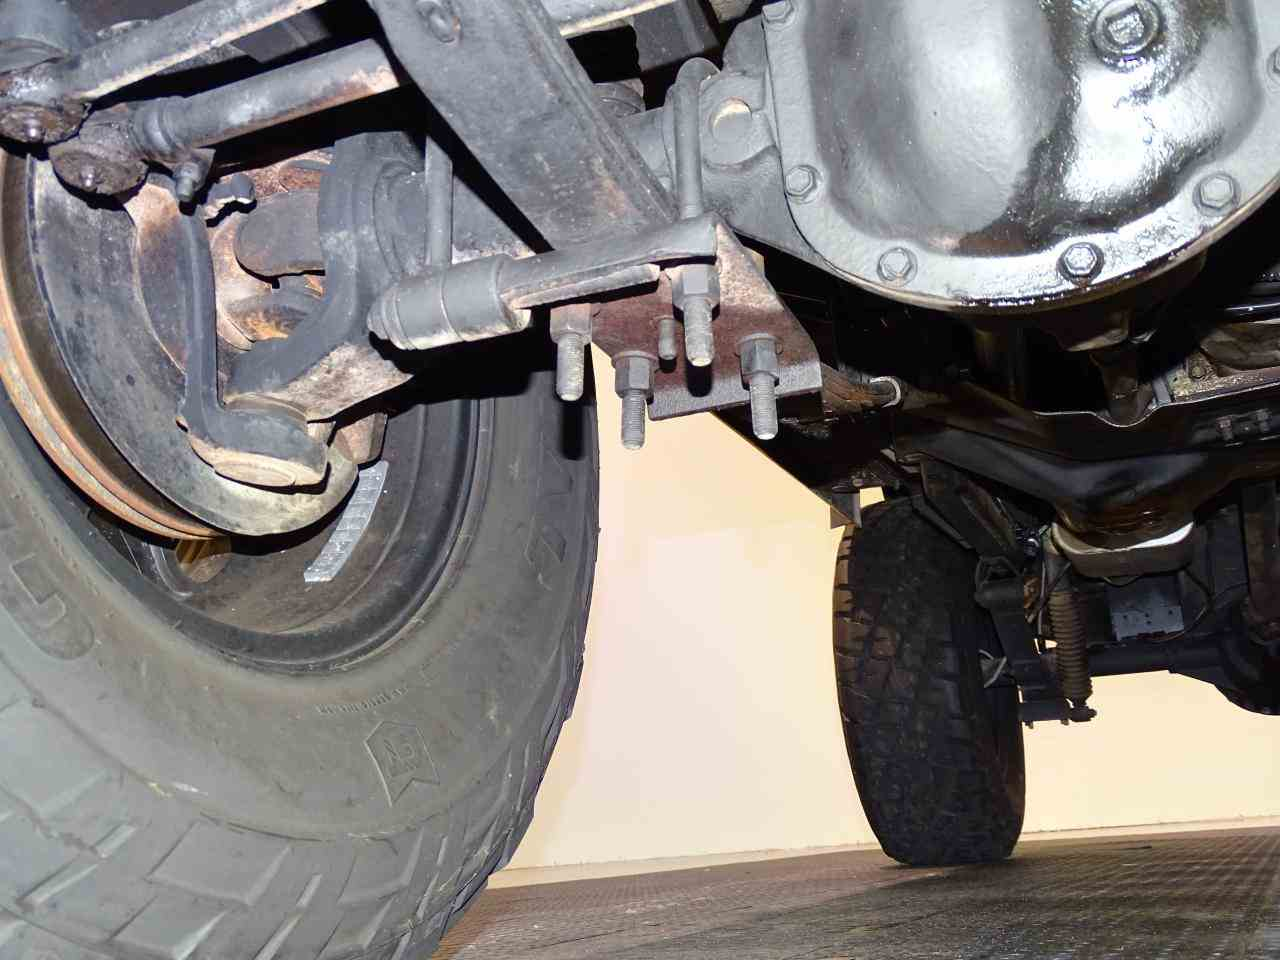 Large Picture of '85 Jeep CJ8 Scrambler - $32,595.00 - KEST